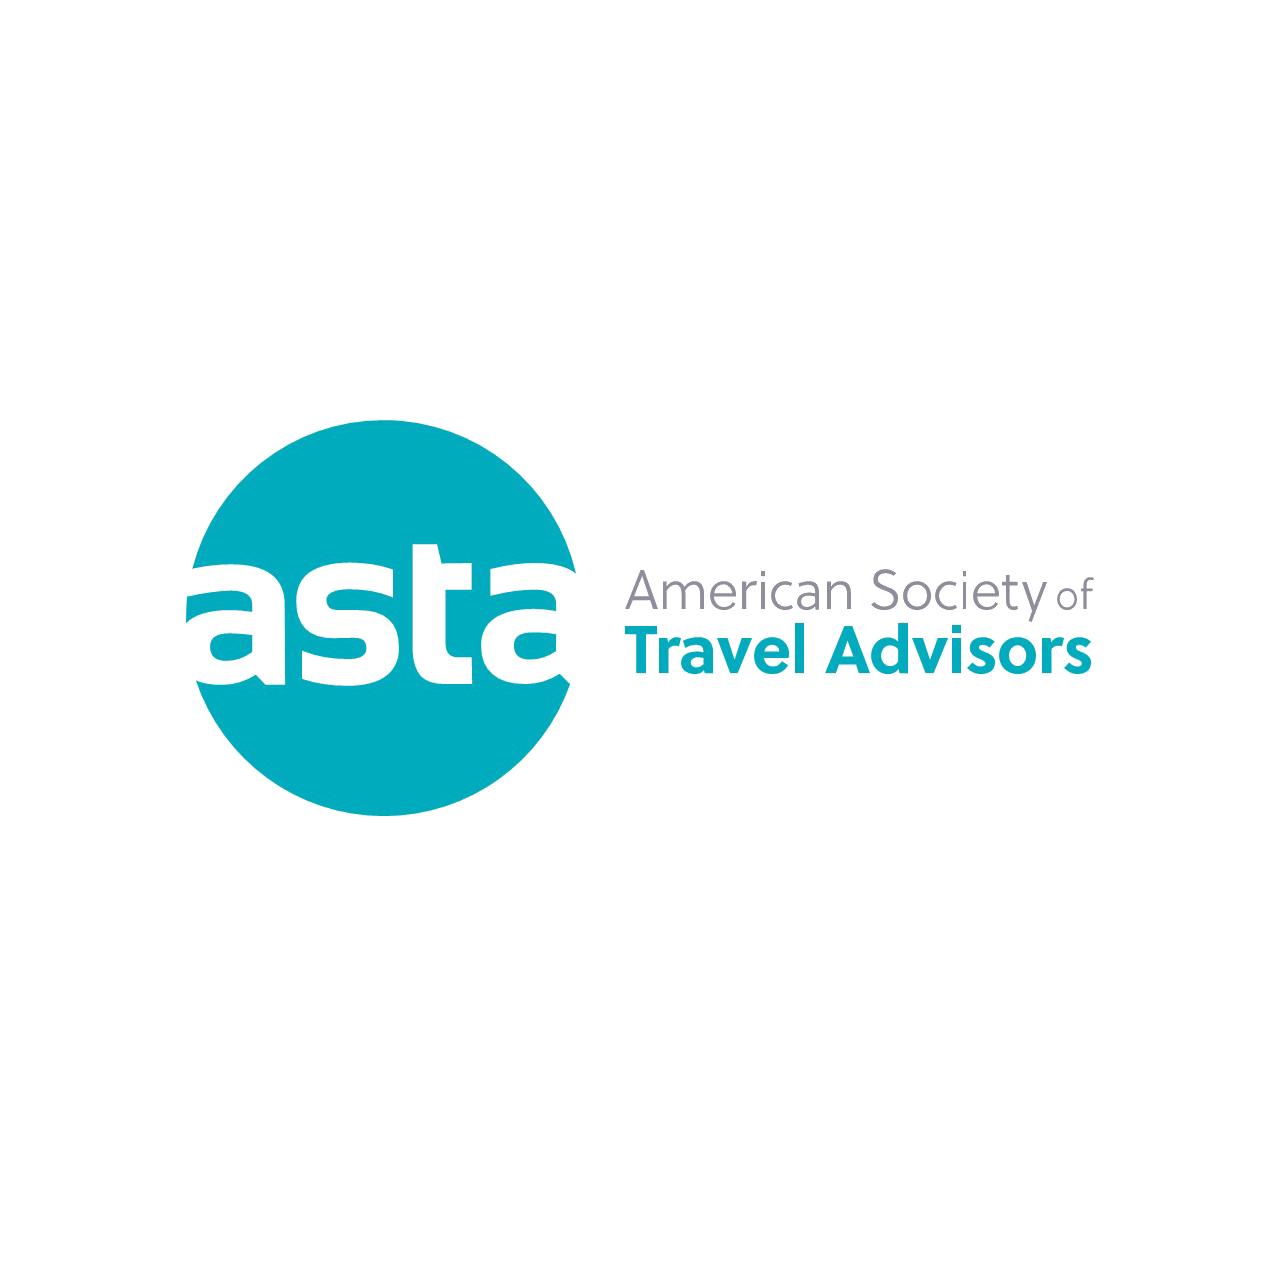 American Society of Travel Advisors.